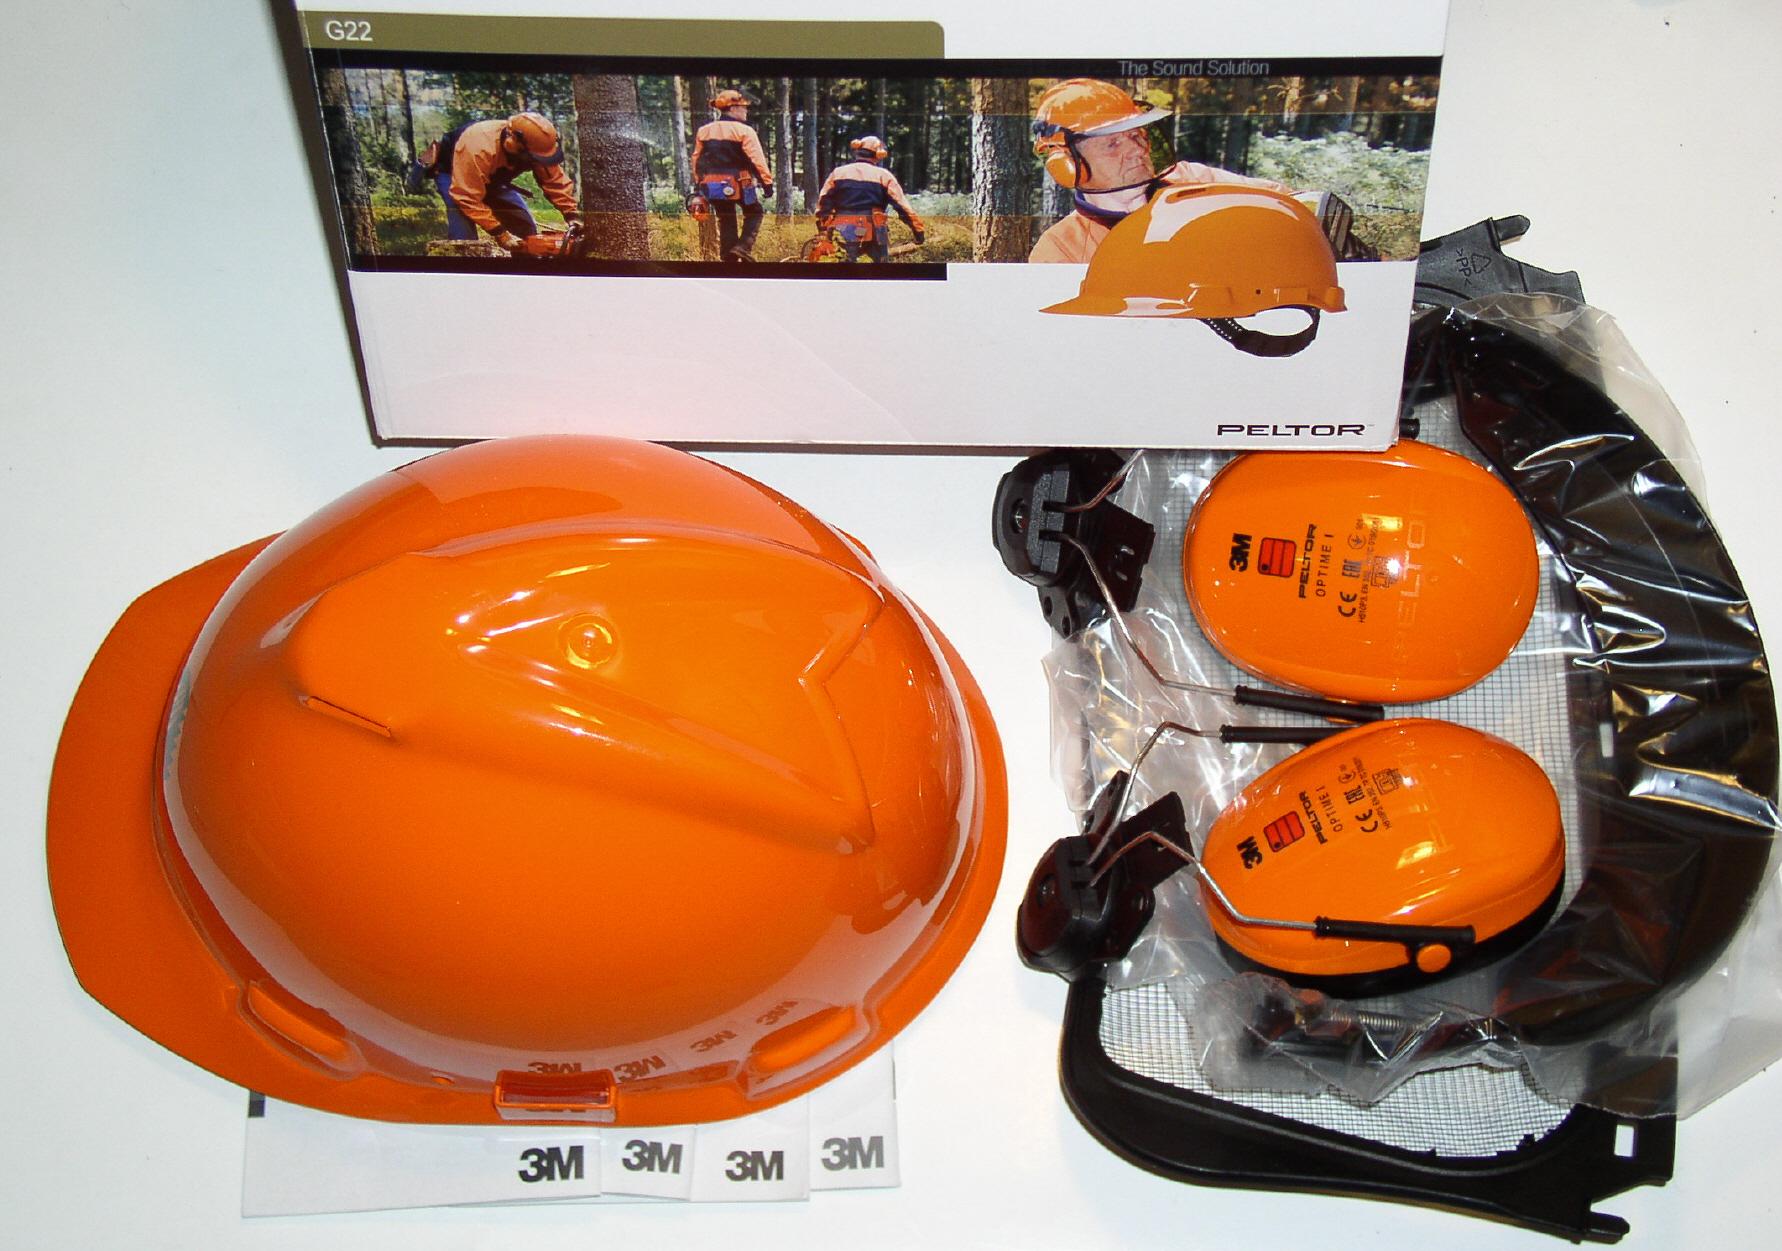 Kombination mit Netz-Visier orange Schutzhelm 3M PELTOR Forsthelm